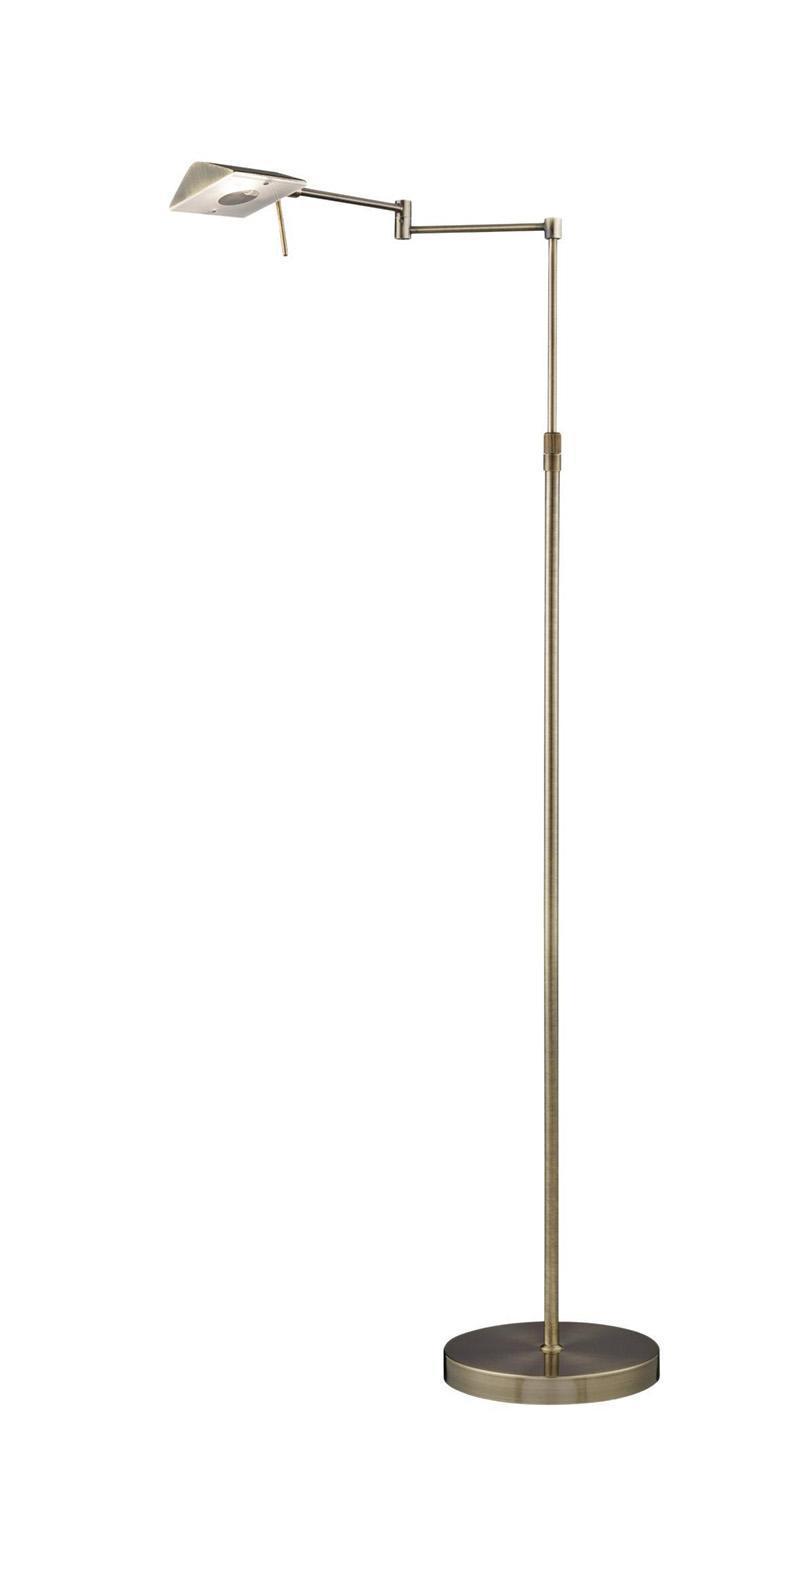 Торшер Arte lamp A5665pn-1ab